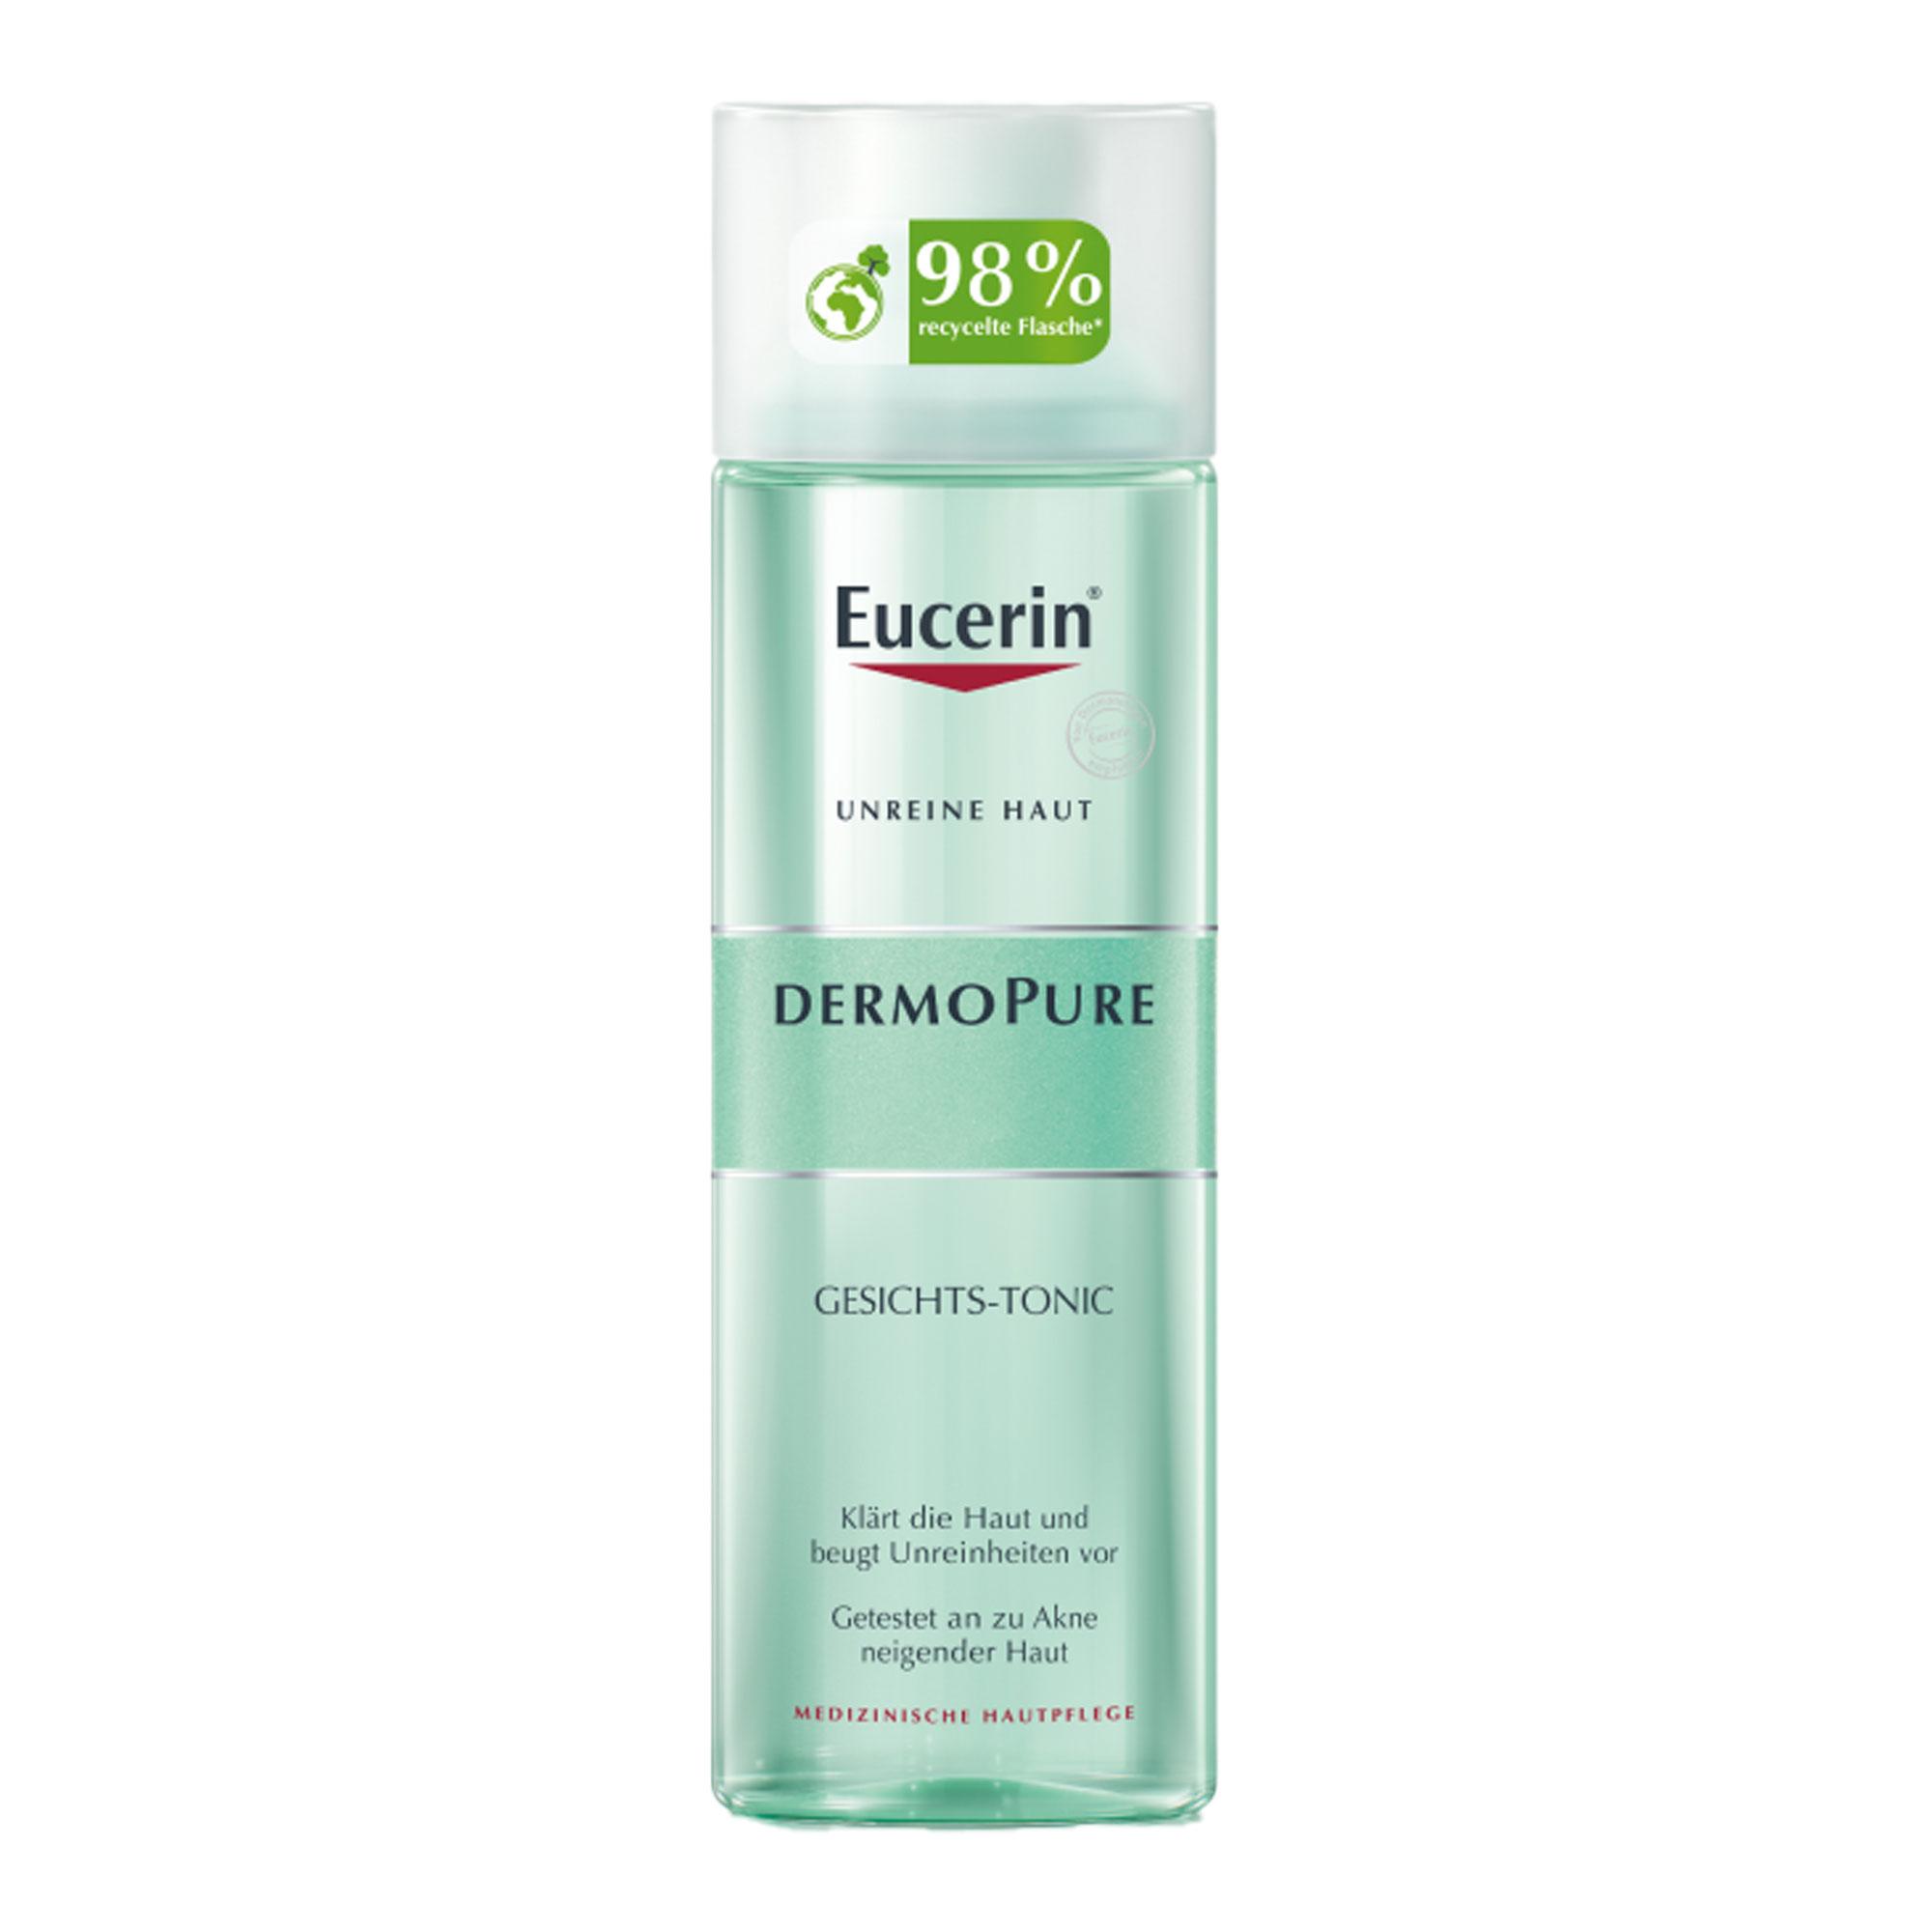 Eucerin DermoPure Gesichts-Tonic